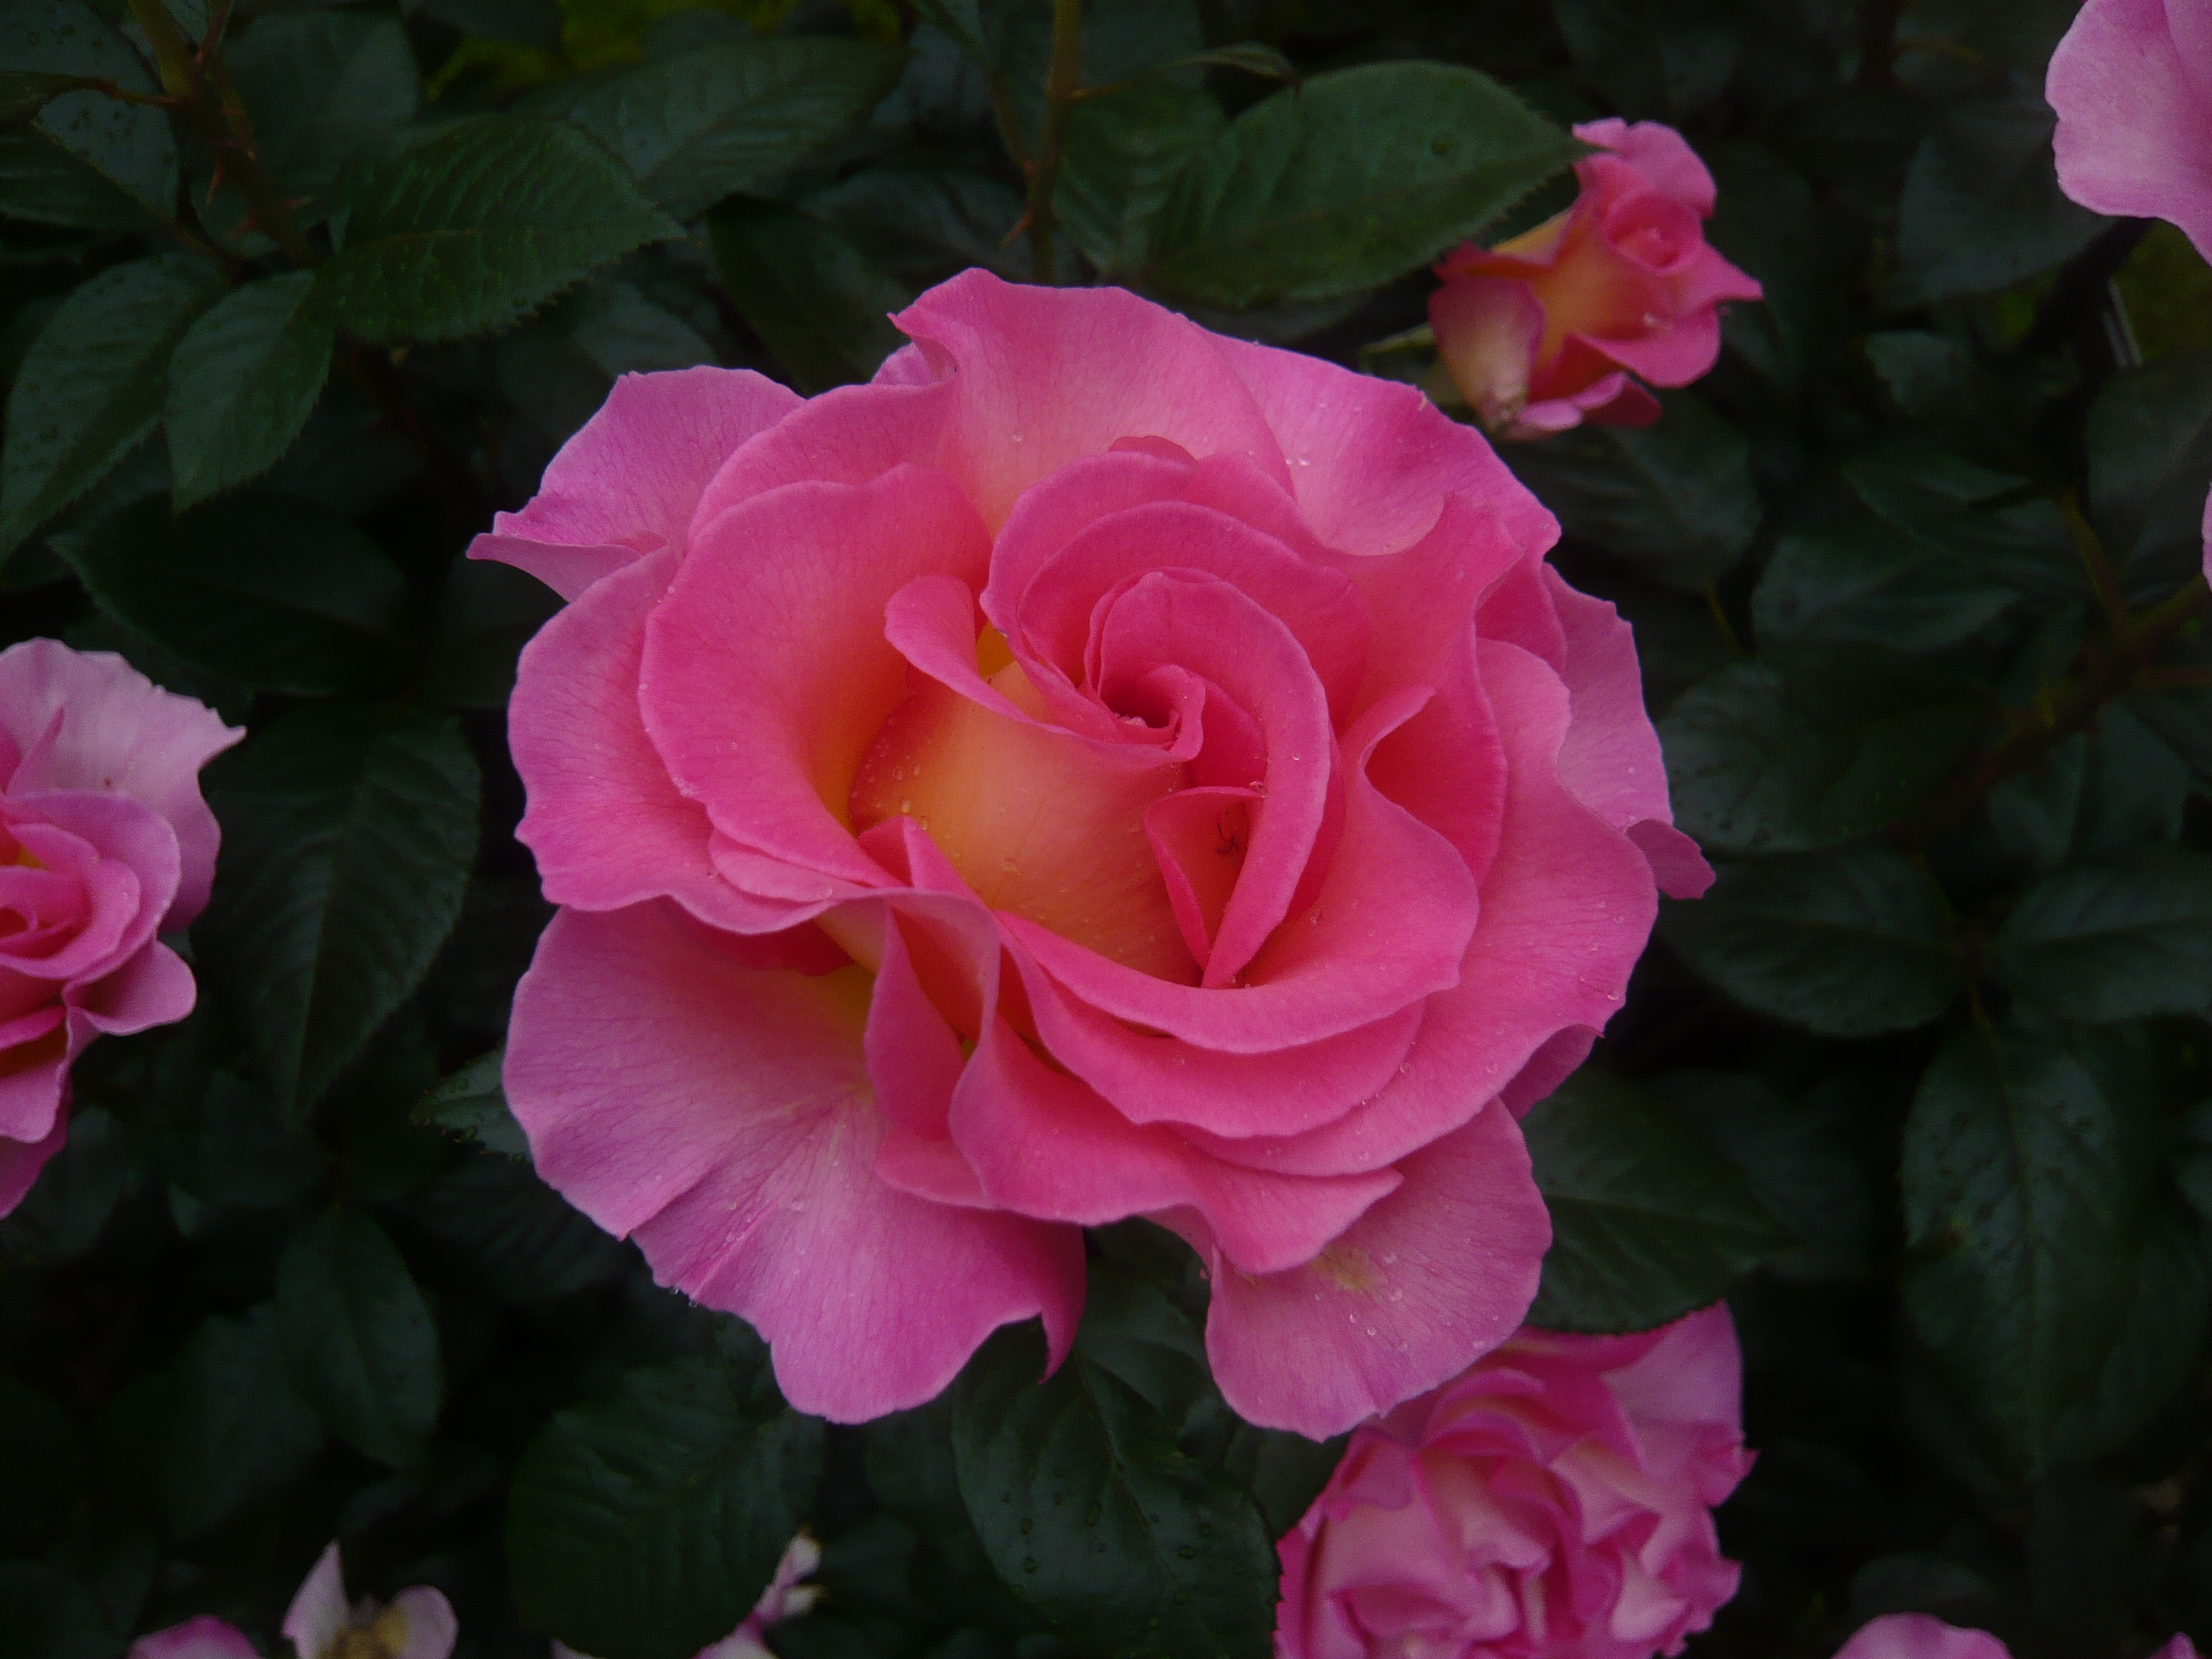 представлены роза парадиз фото и описание материалов